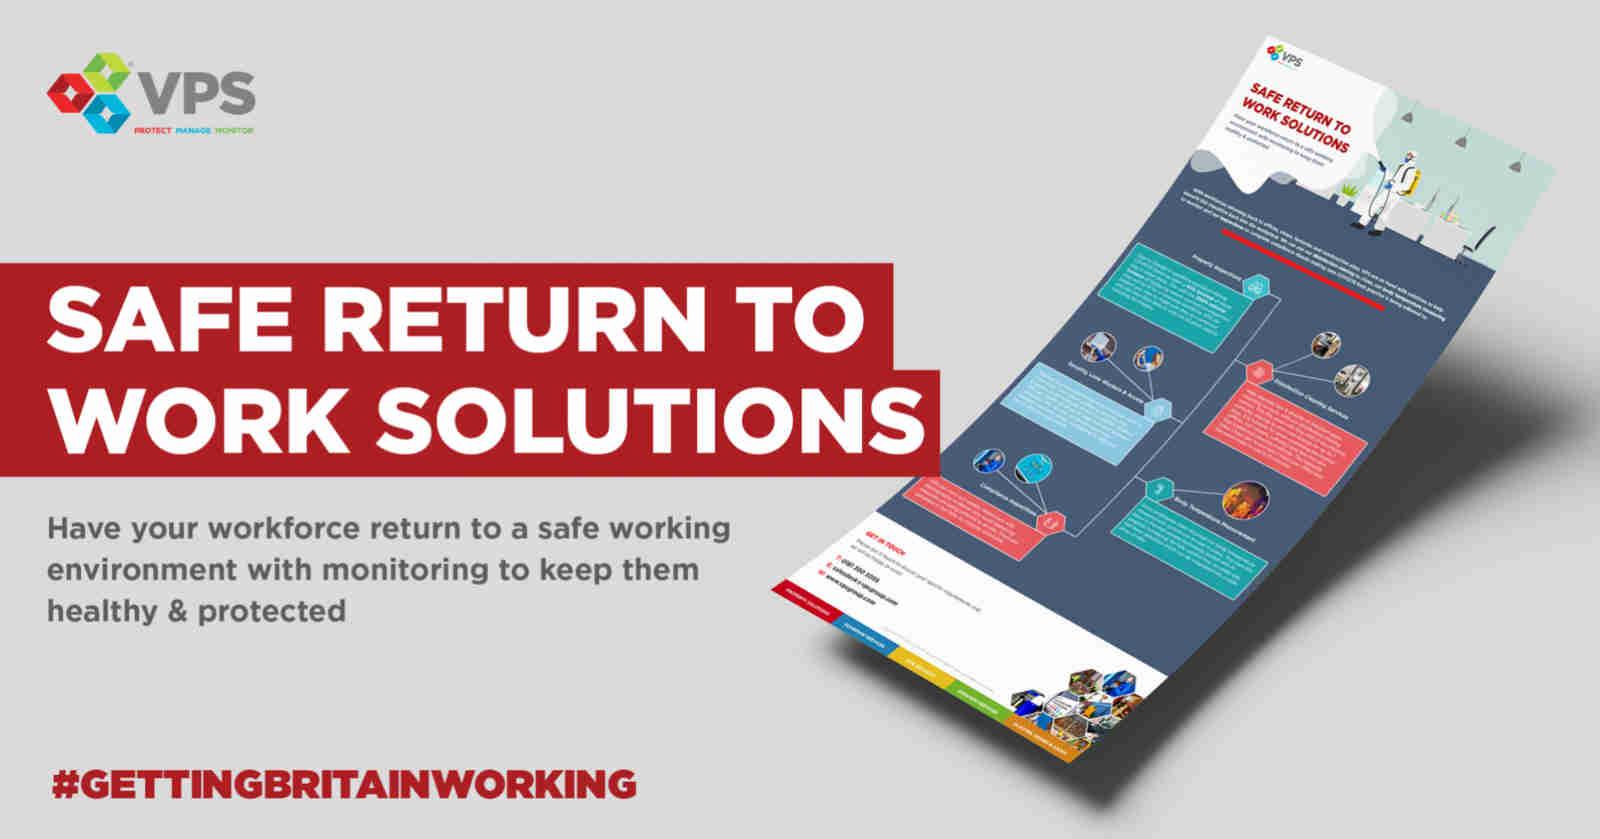 Safe Return To Work Solutions